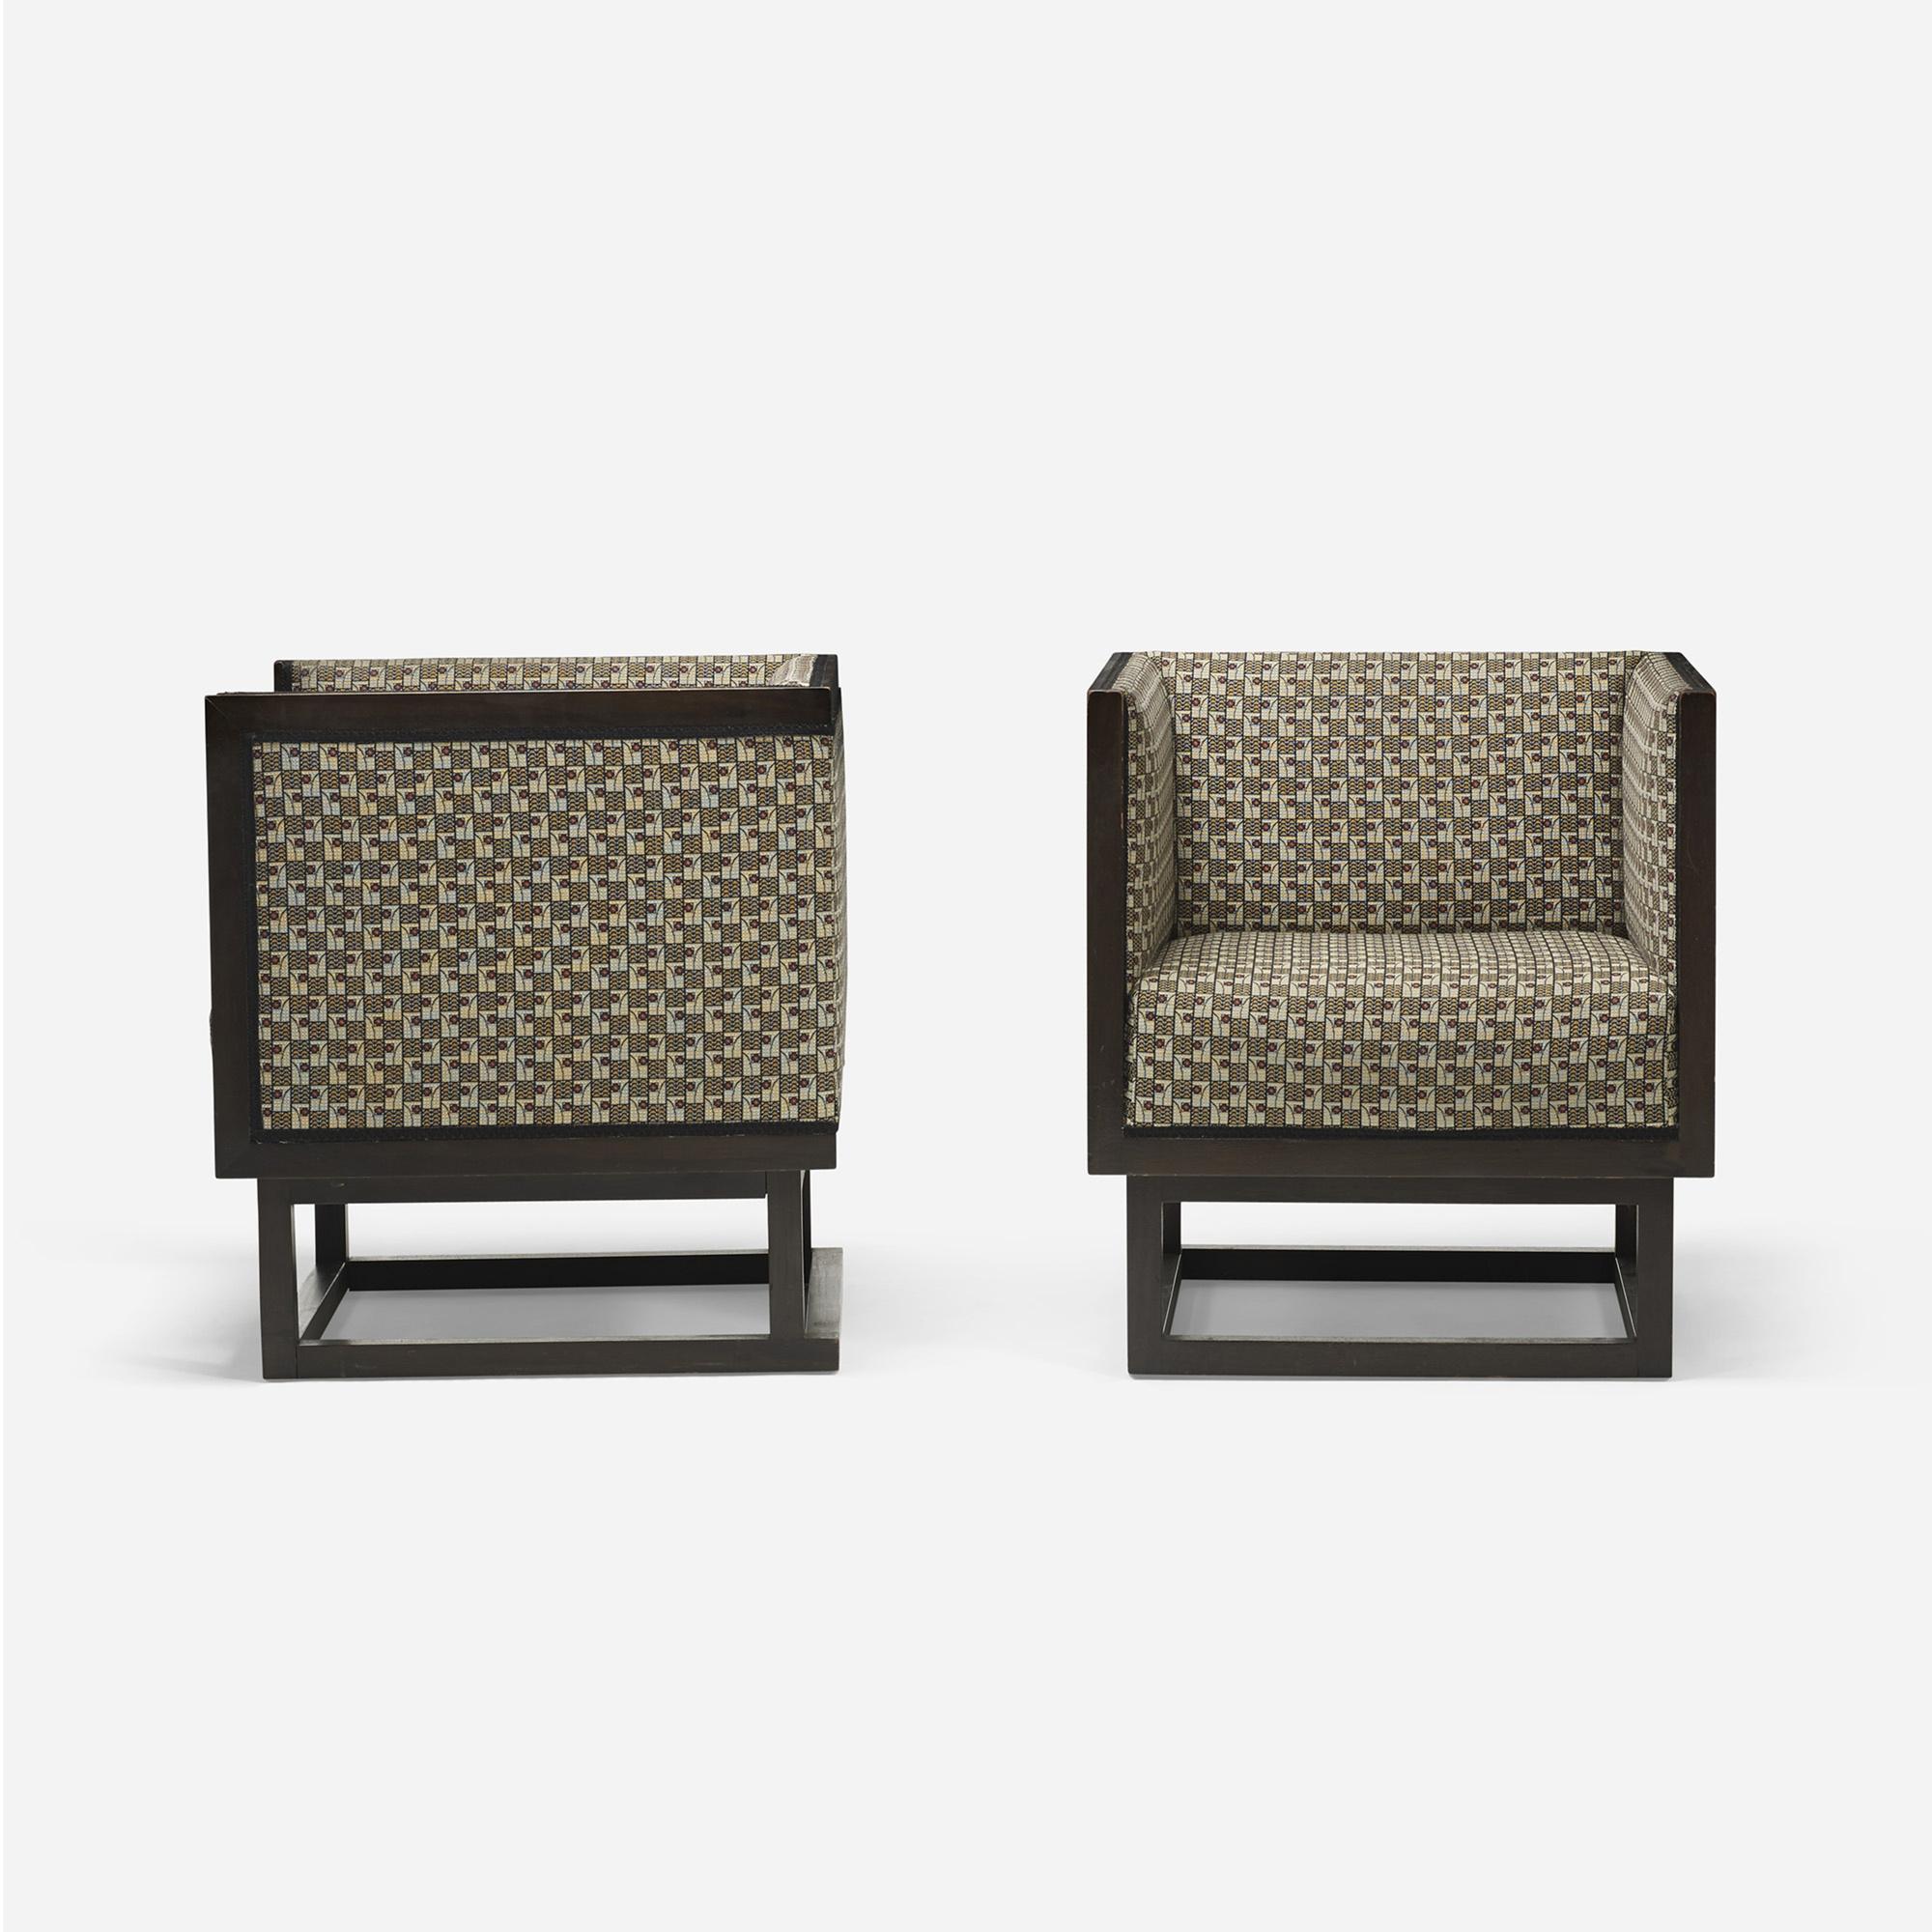 355: Josef Hoffmann / Cabinett lounge chairs, pair (3 of 5)